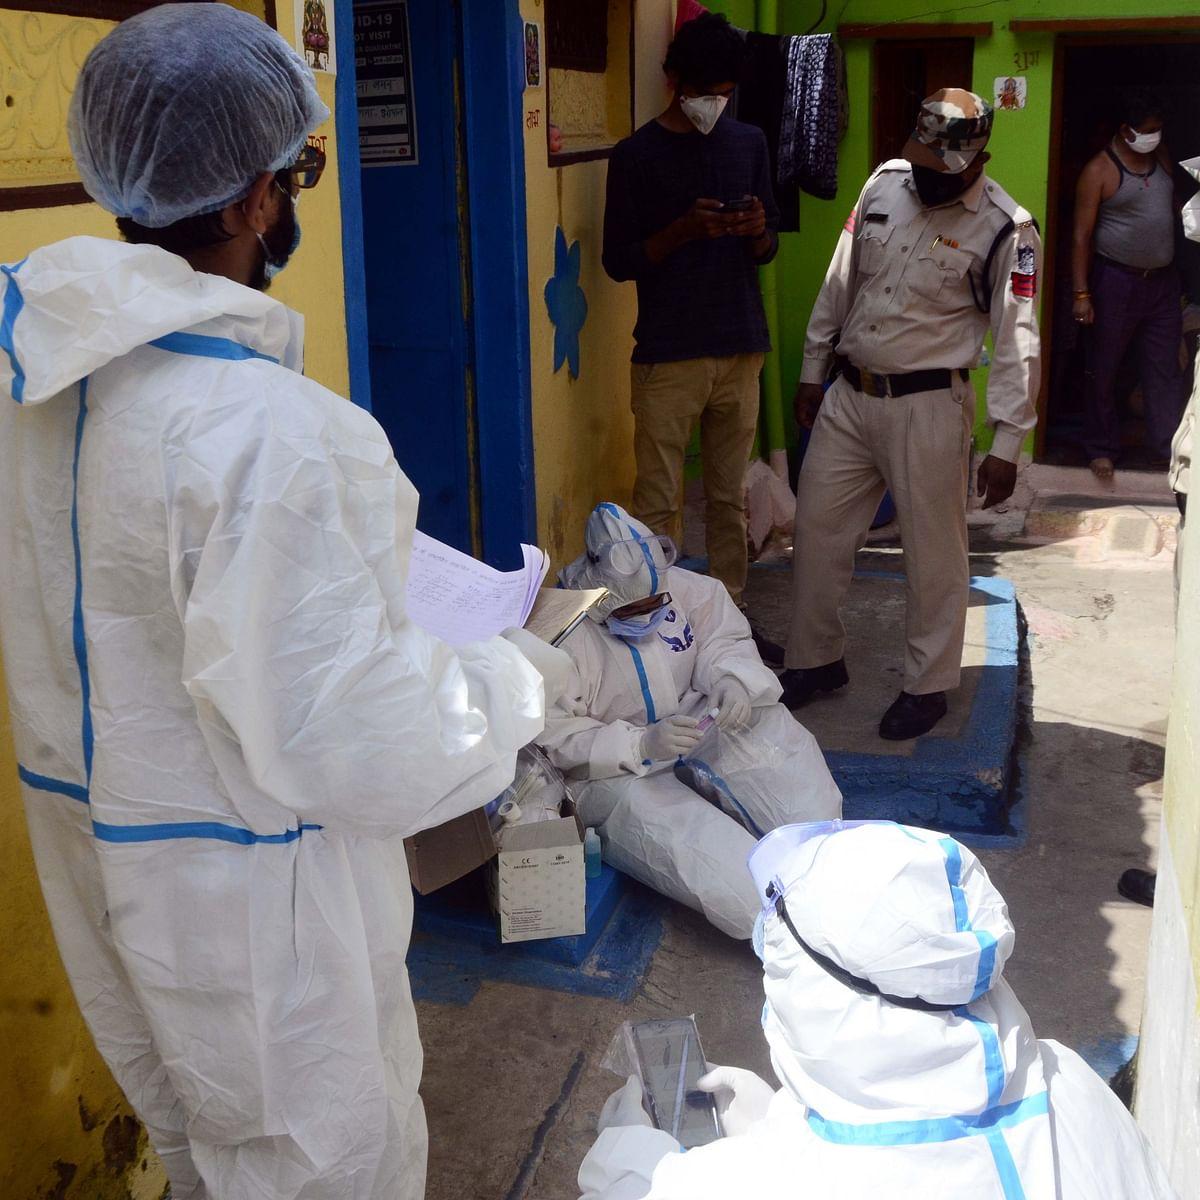 Coronavirus in Bhopal: NHM staffer, fever clinic doctor among 75 fresh cases